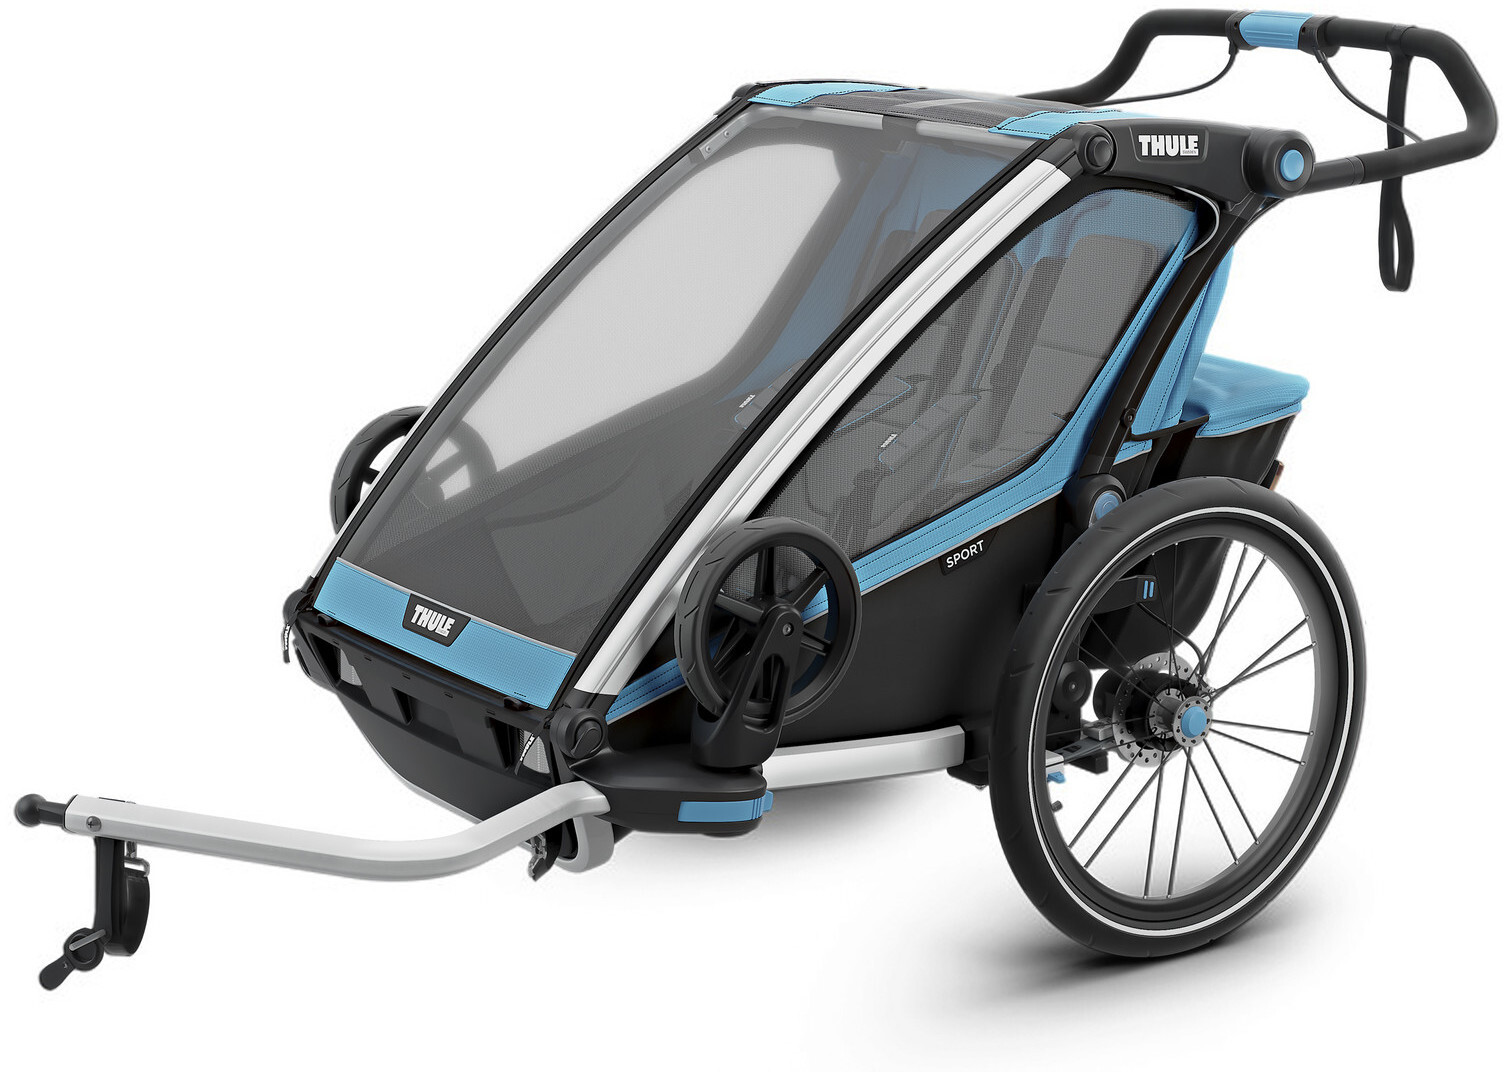 Thule Chariot Sport 2 Cykelanhænger, thule blue/black | Trailer til cykler